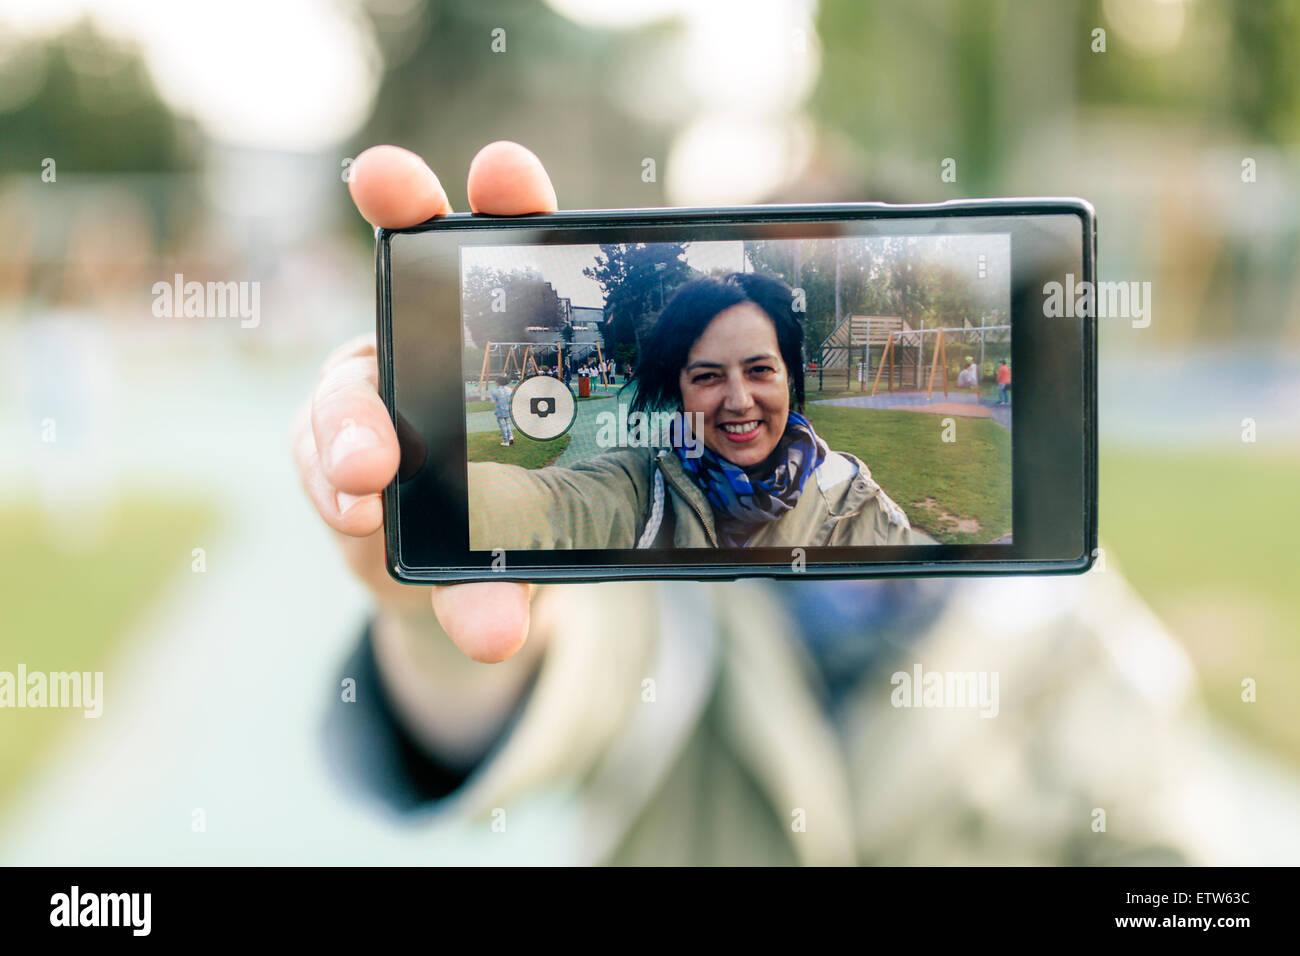 Reife Frau unter Selfie, mit Smartphone Stockbild